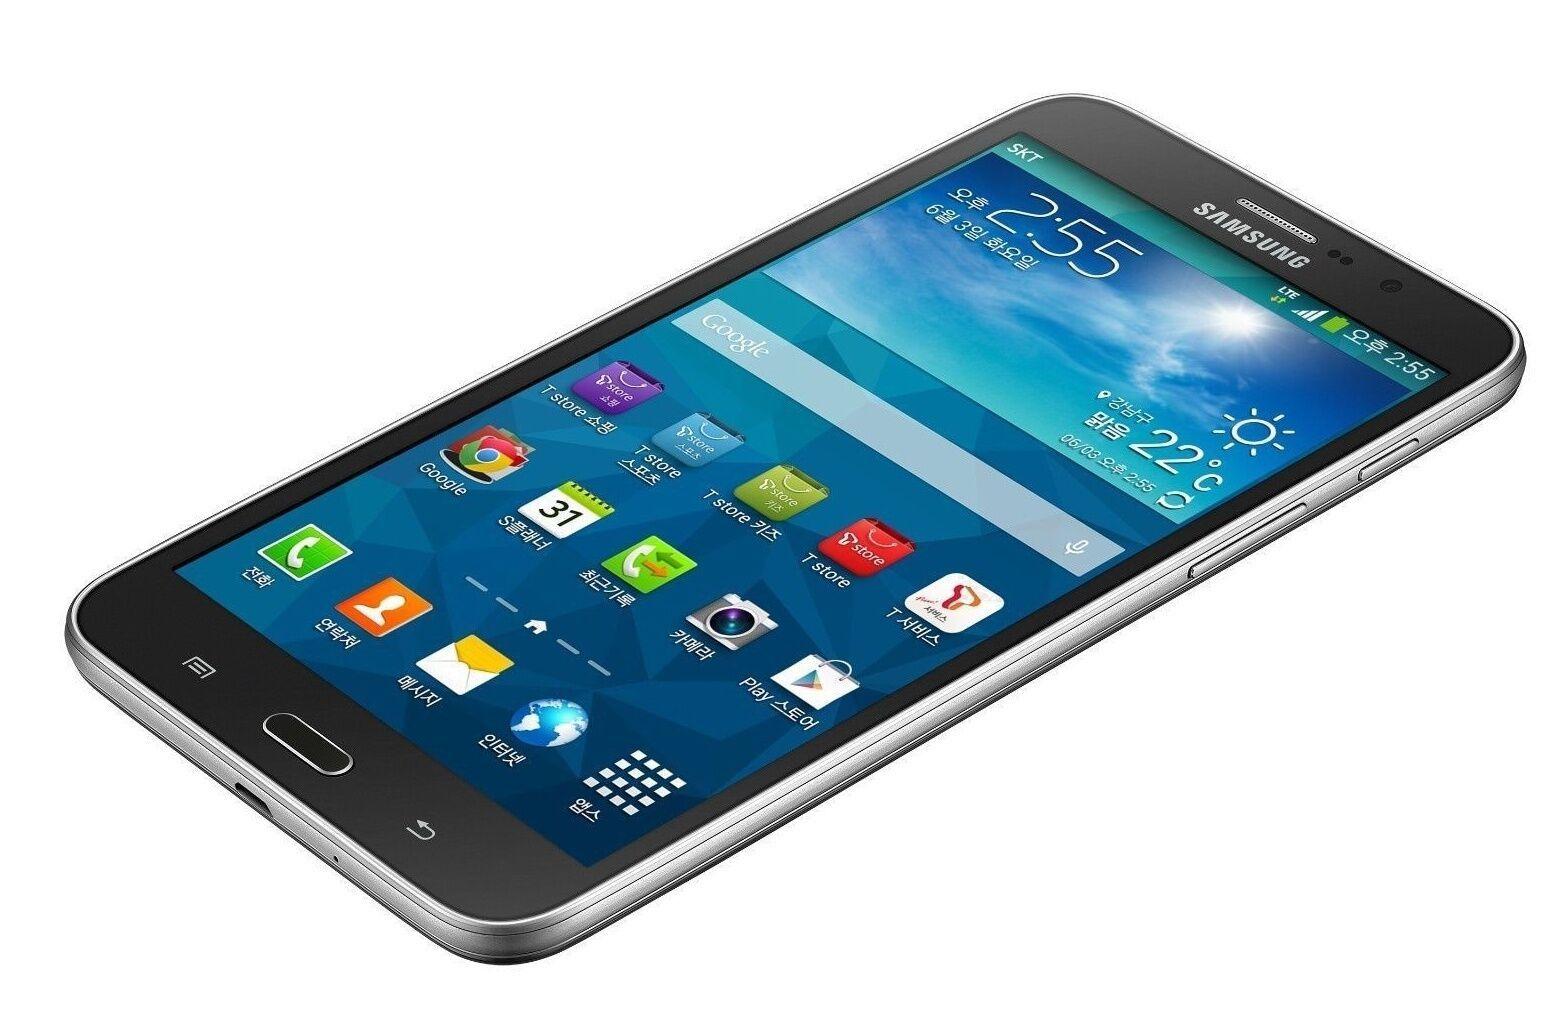 Samsung Smartphone Galaxy W SM-T255S 7.0 inch 16GB (Black color)